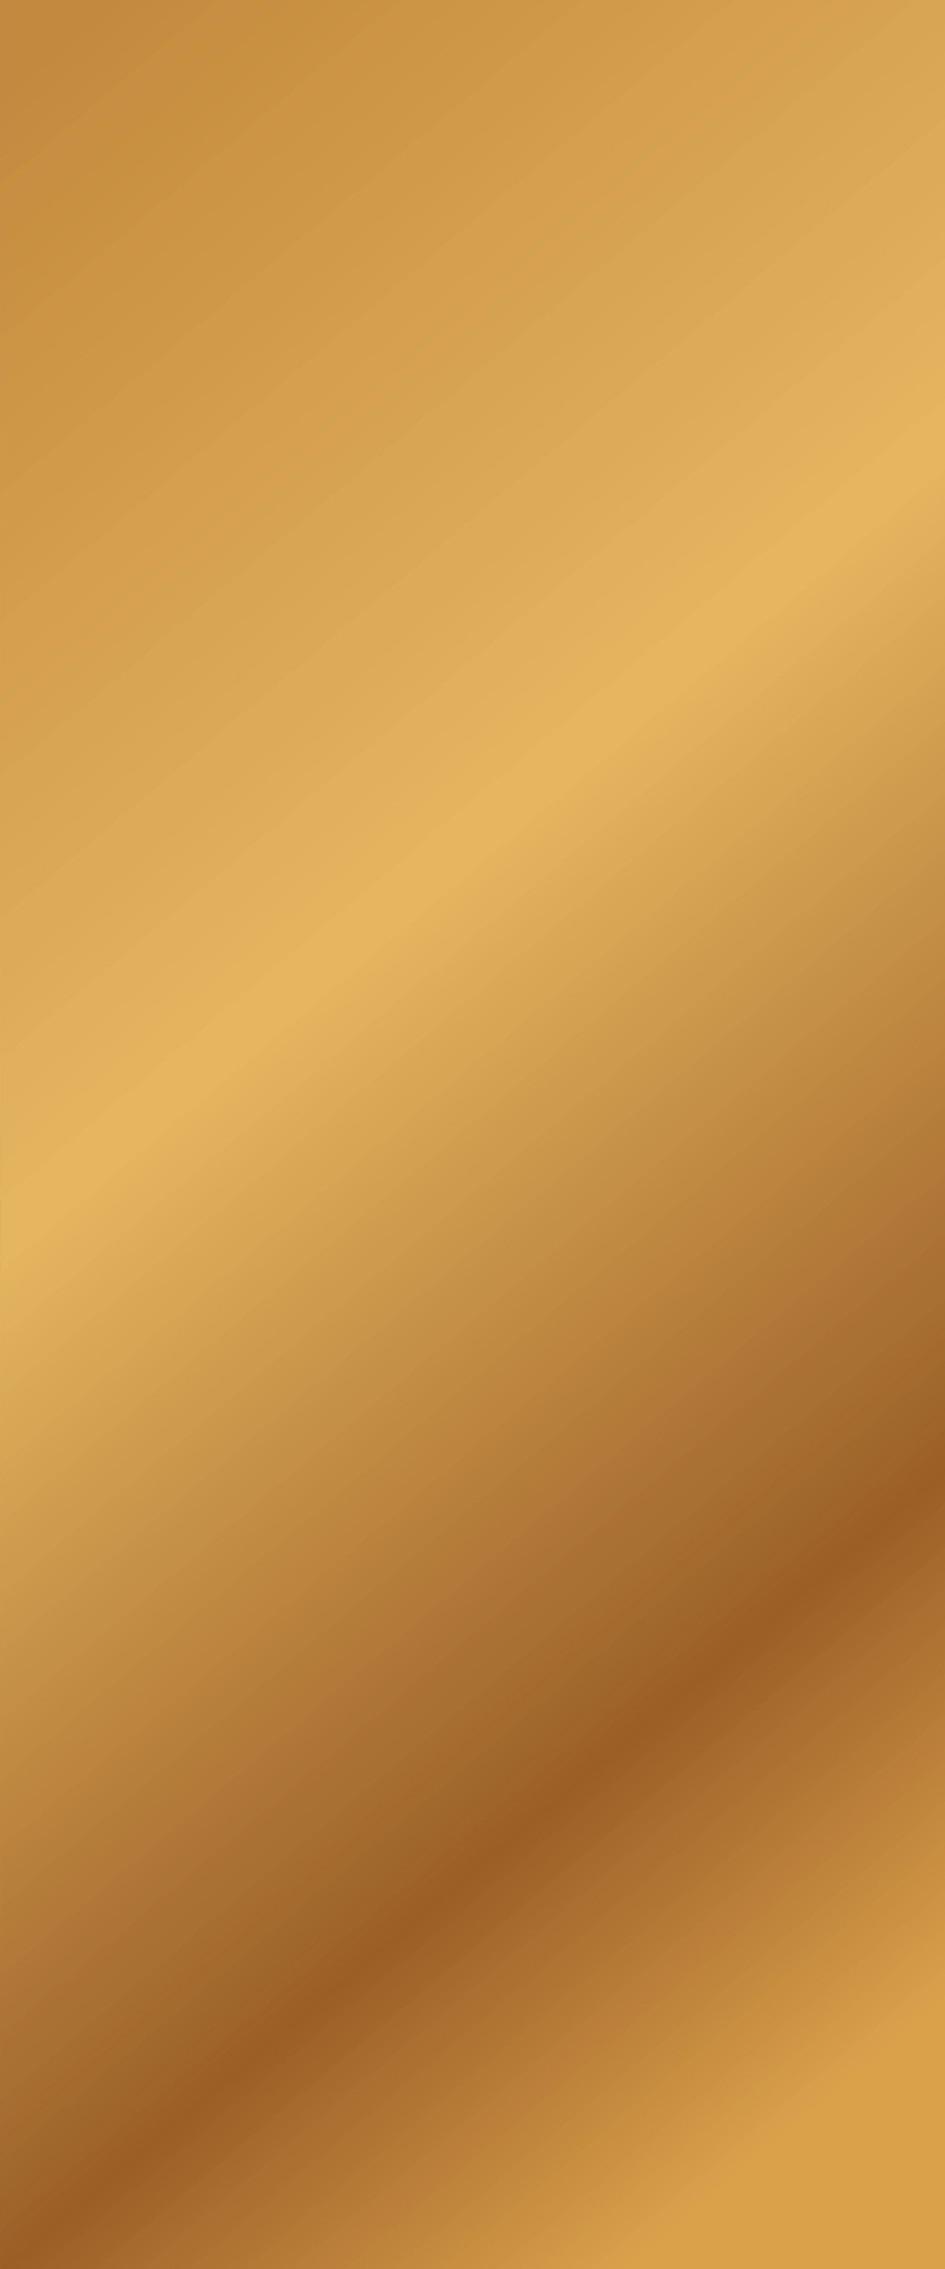 Jazzle-Beauty_Background_Gold_01_edited_